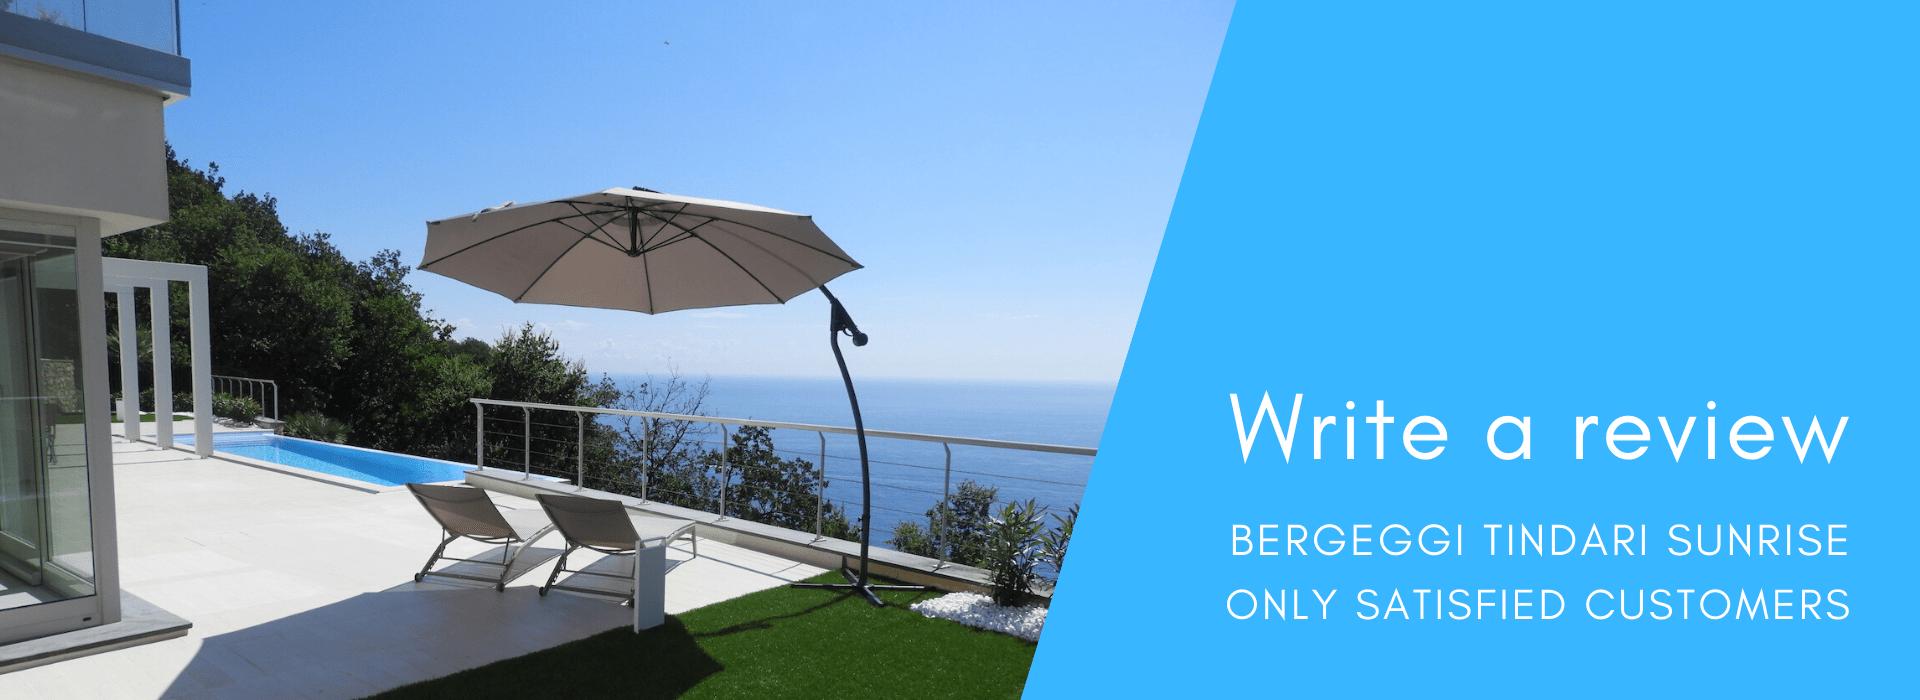 write a review Bergeggi Tindari Sunrise